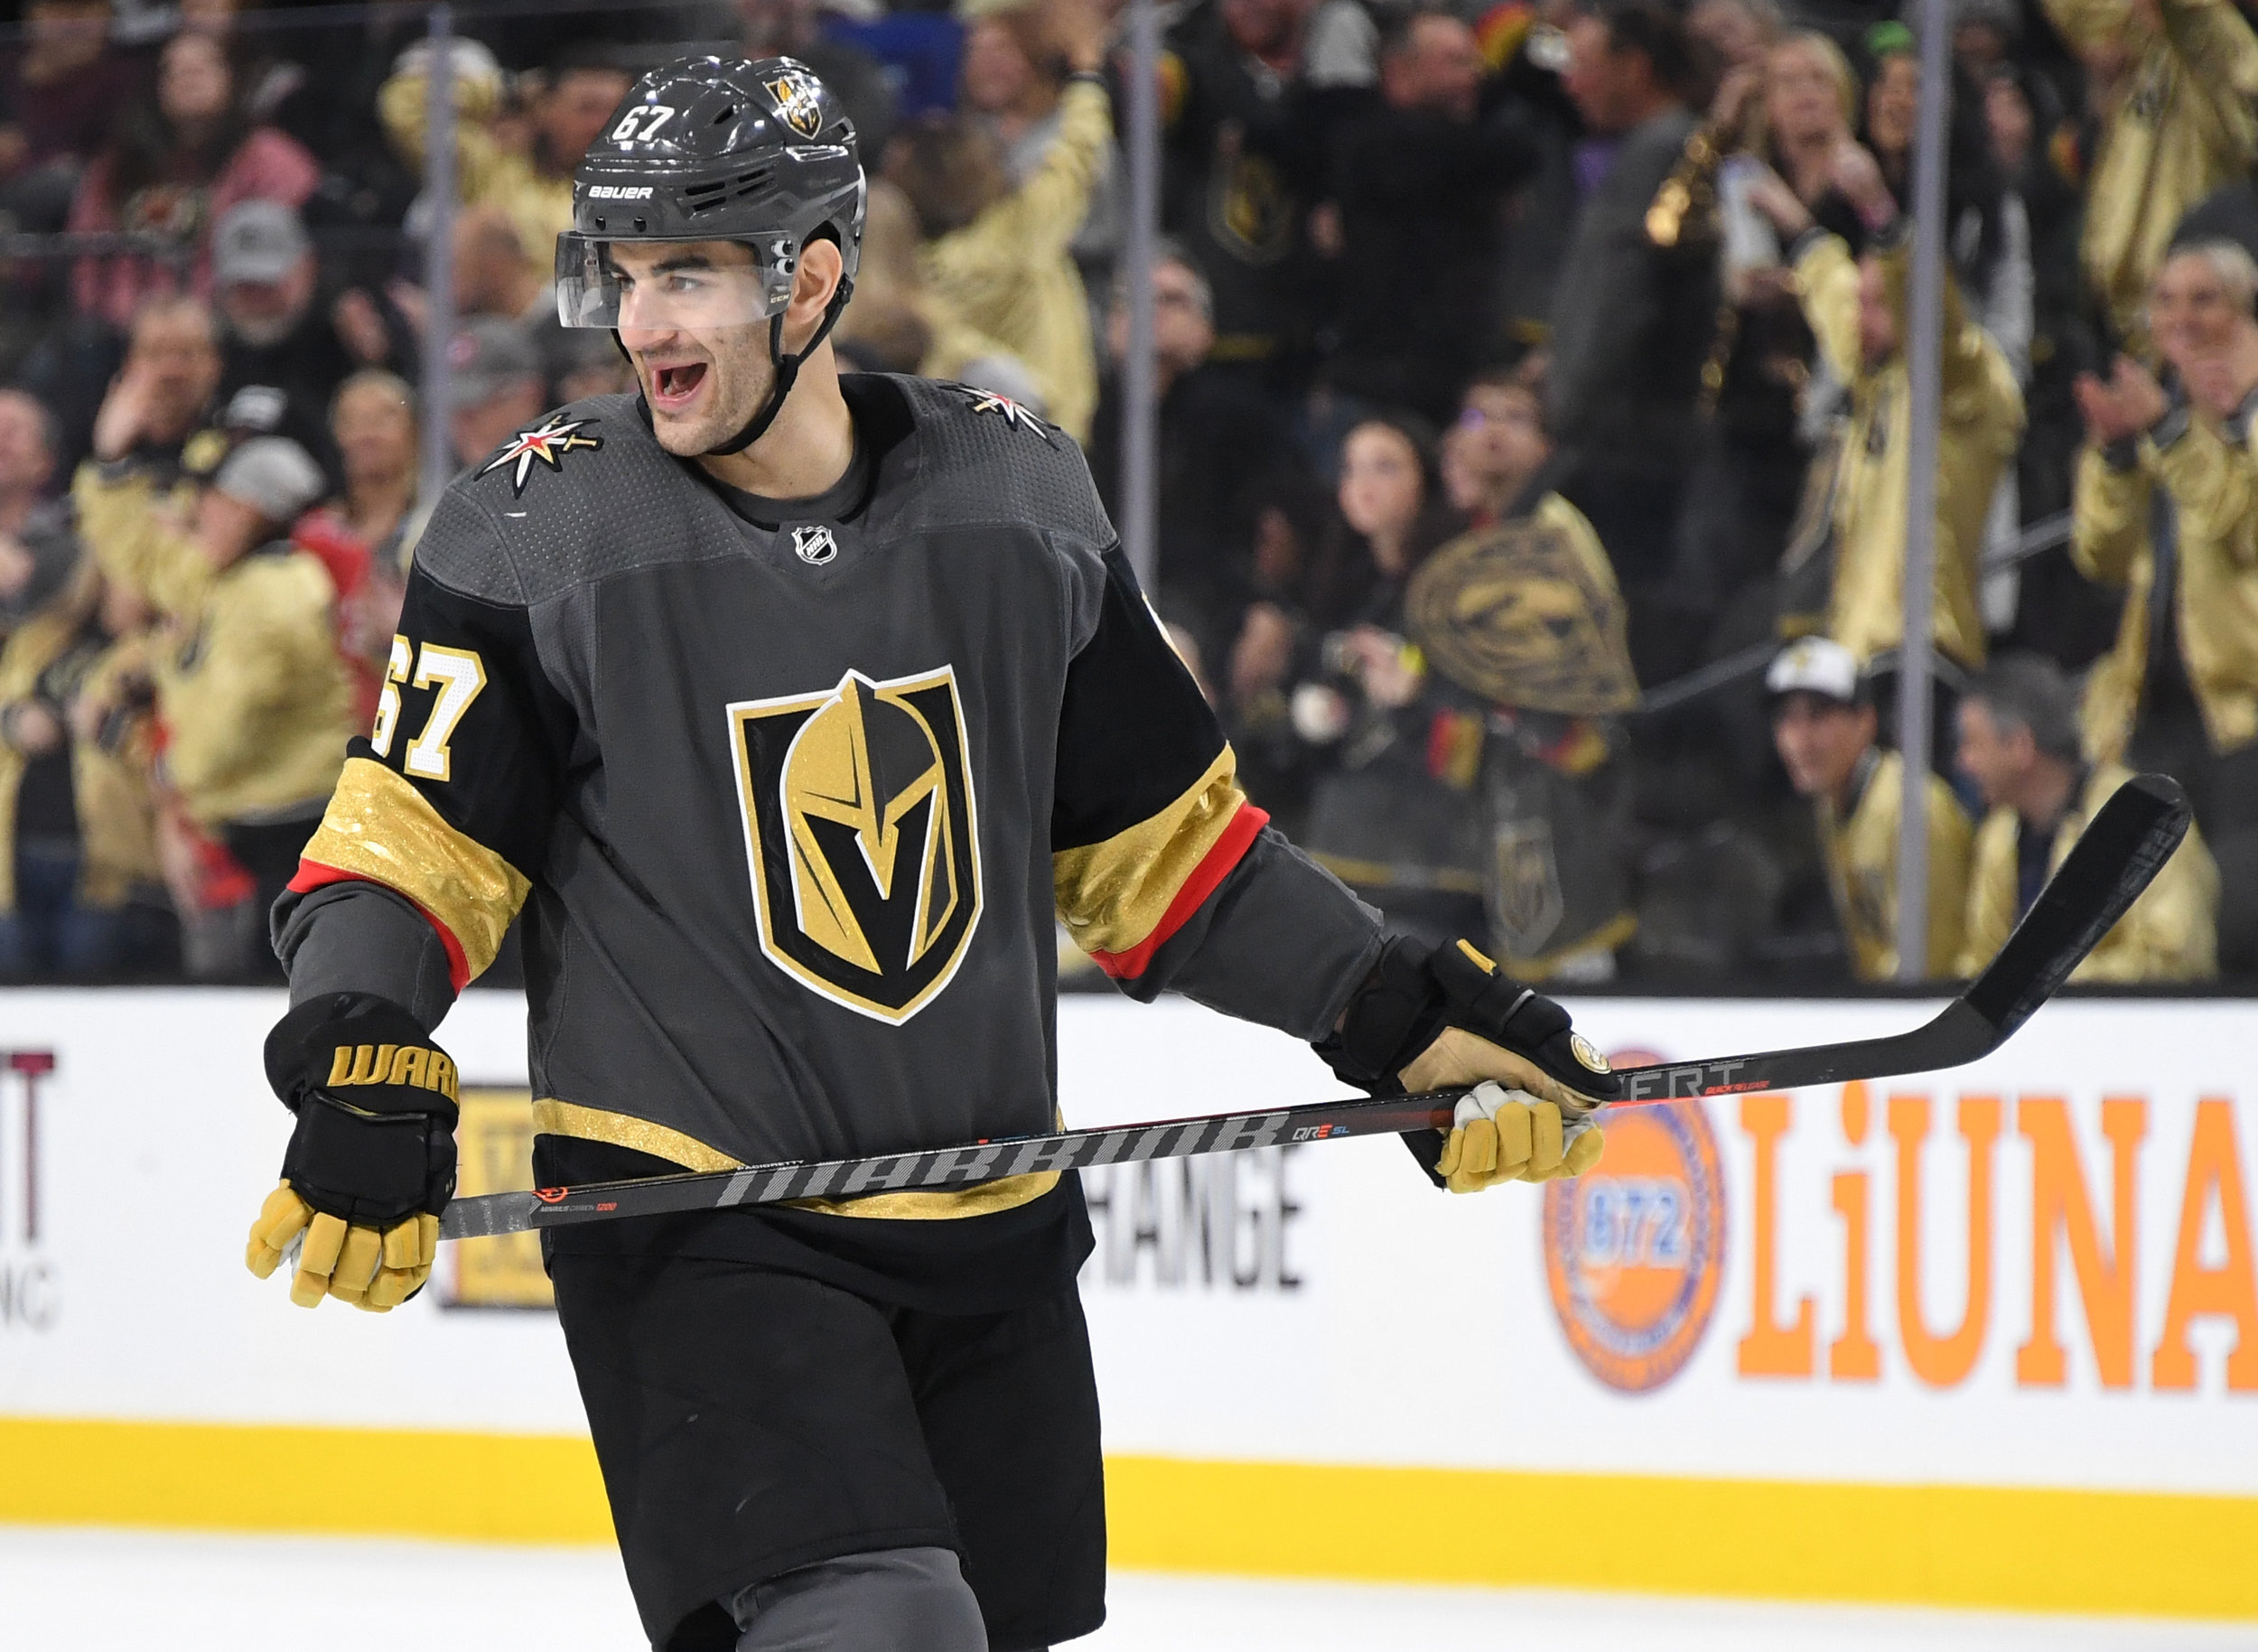 NHL_JB_20190121_3058.jpg